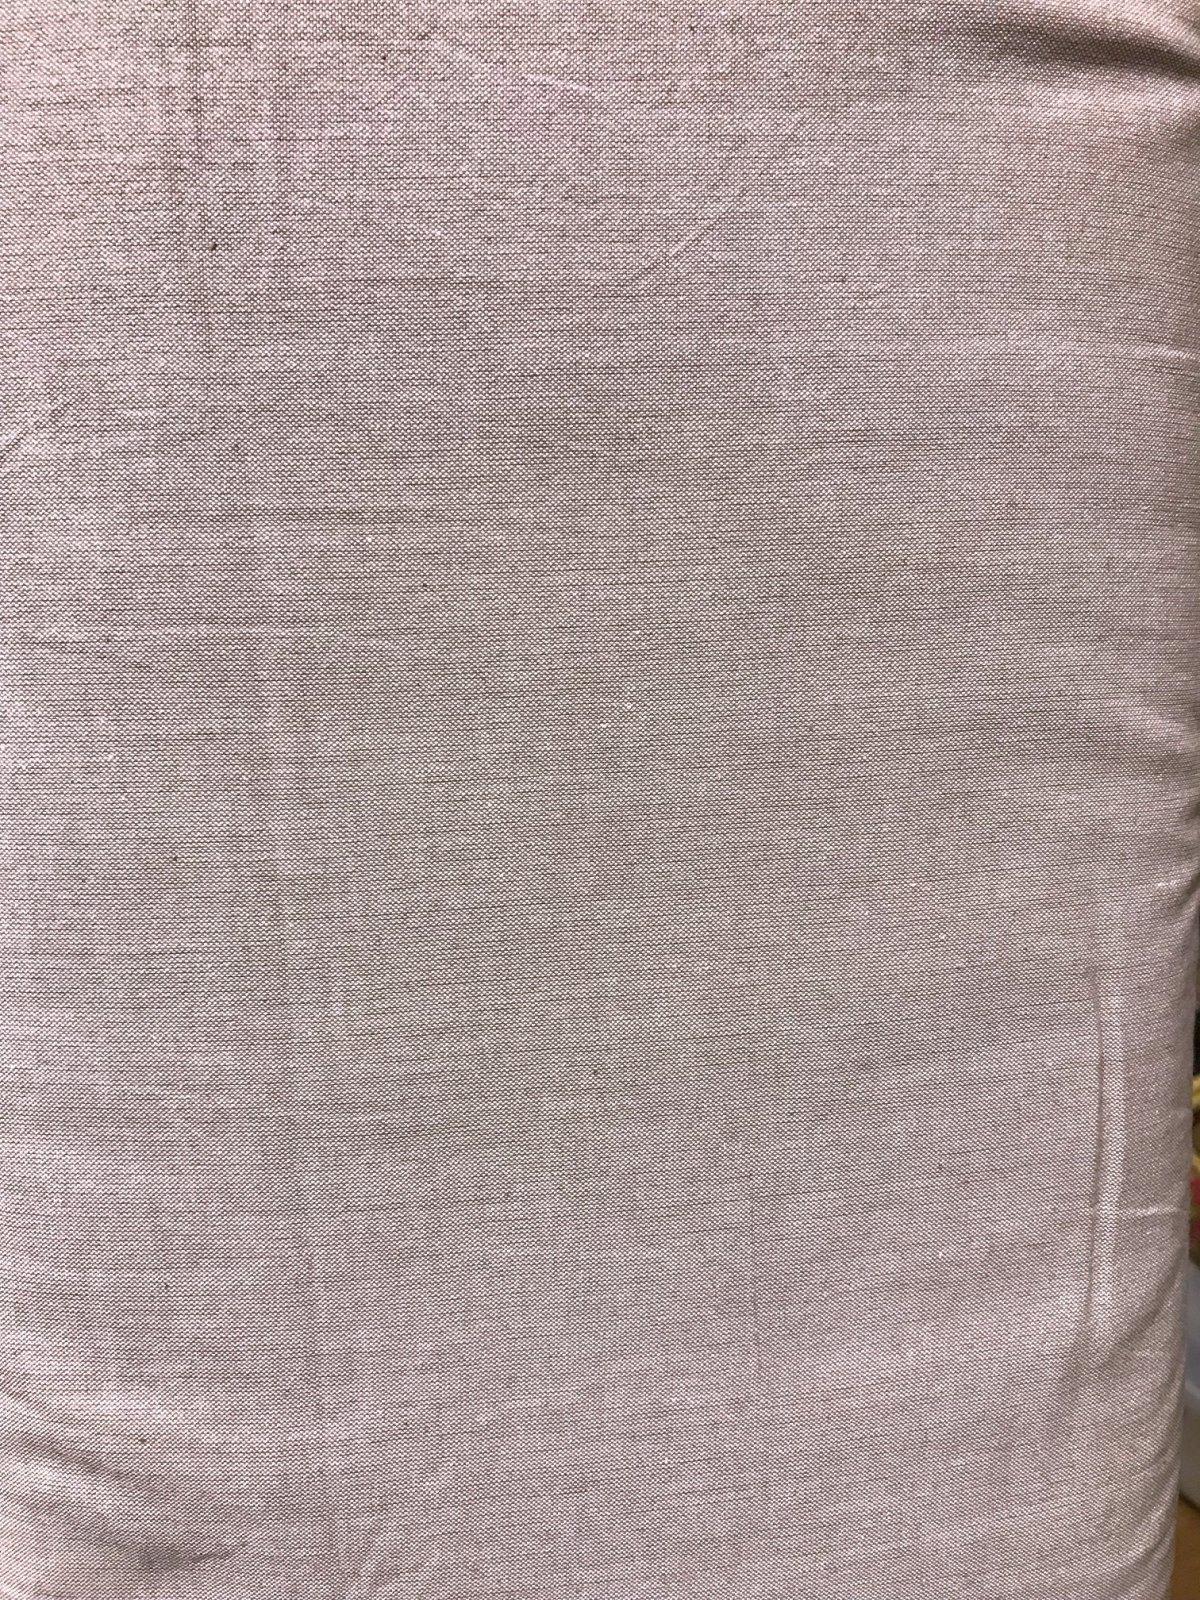 Kent Chambray 2954 Soft Rose Diamond Textiles